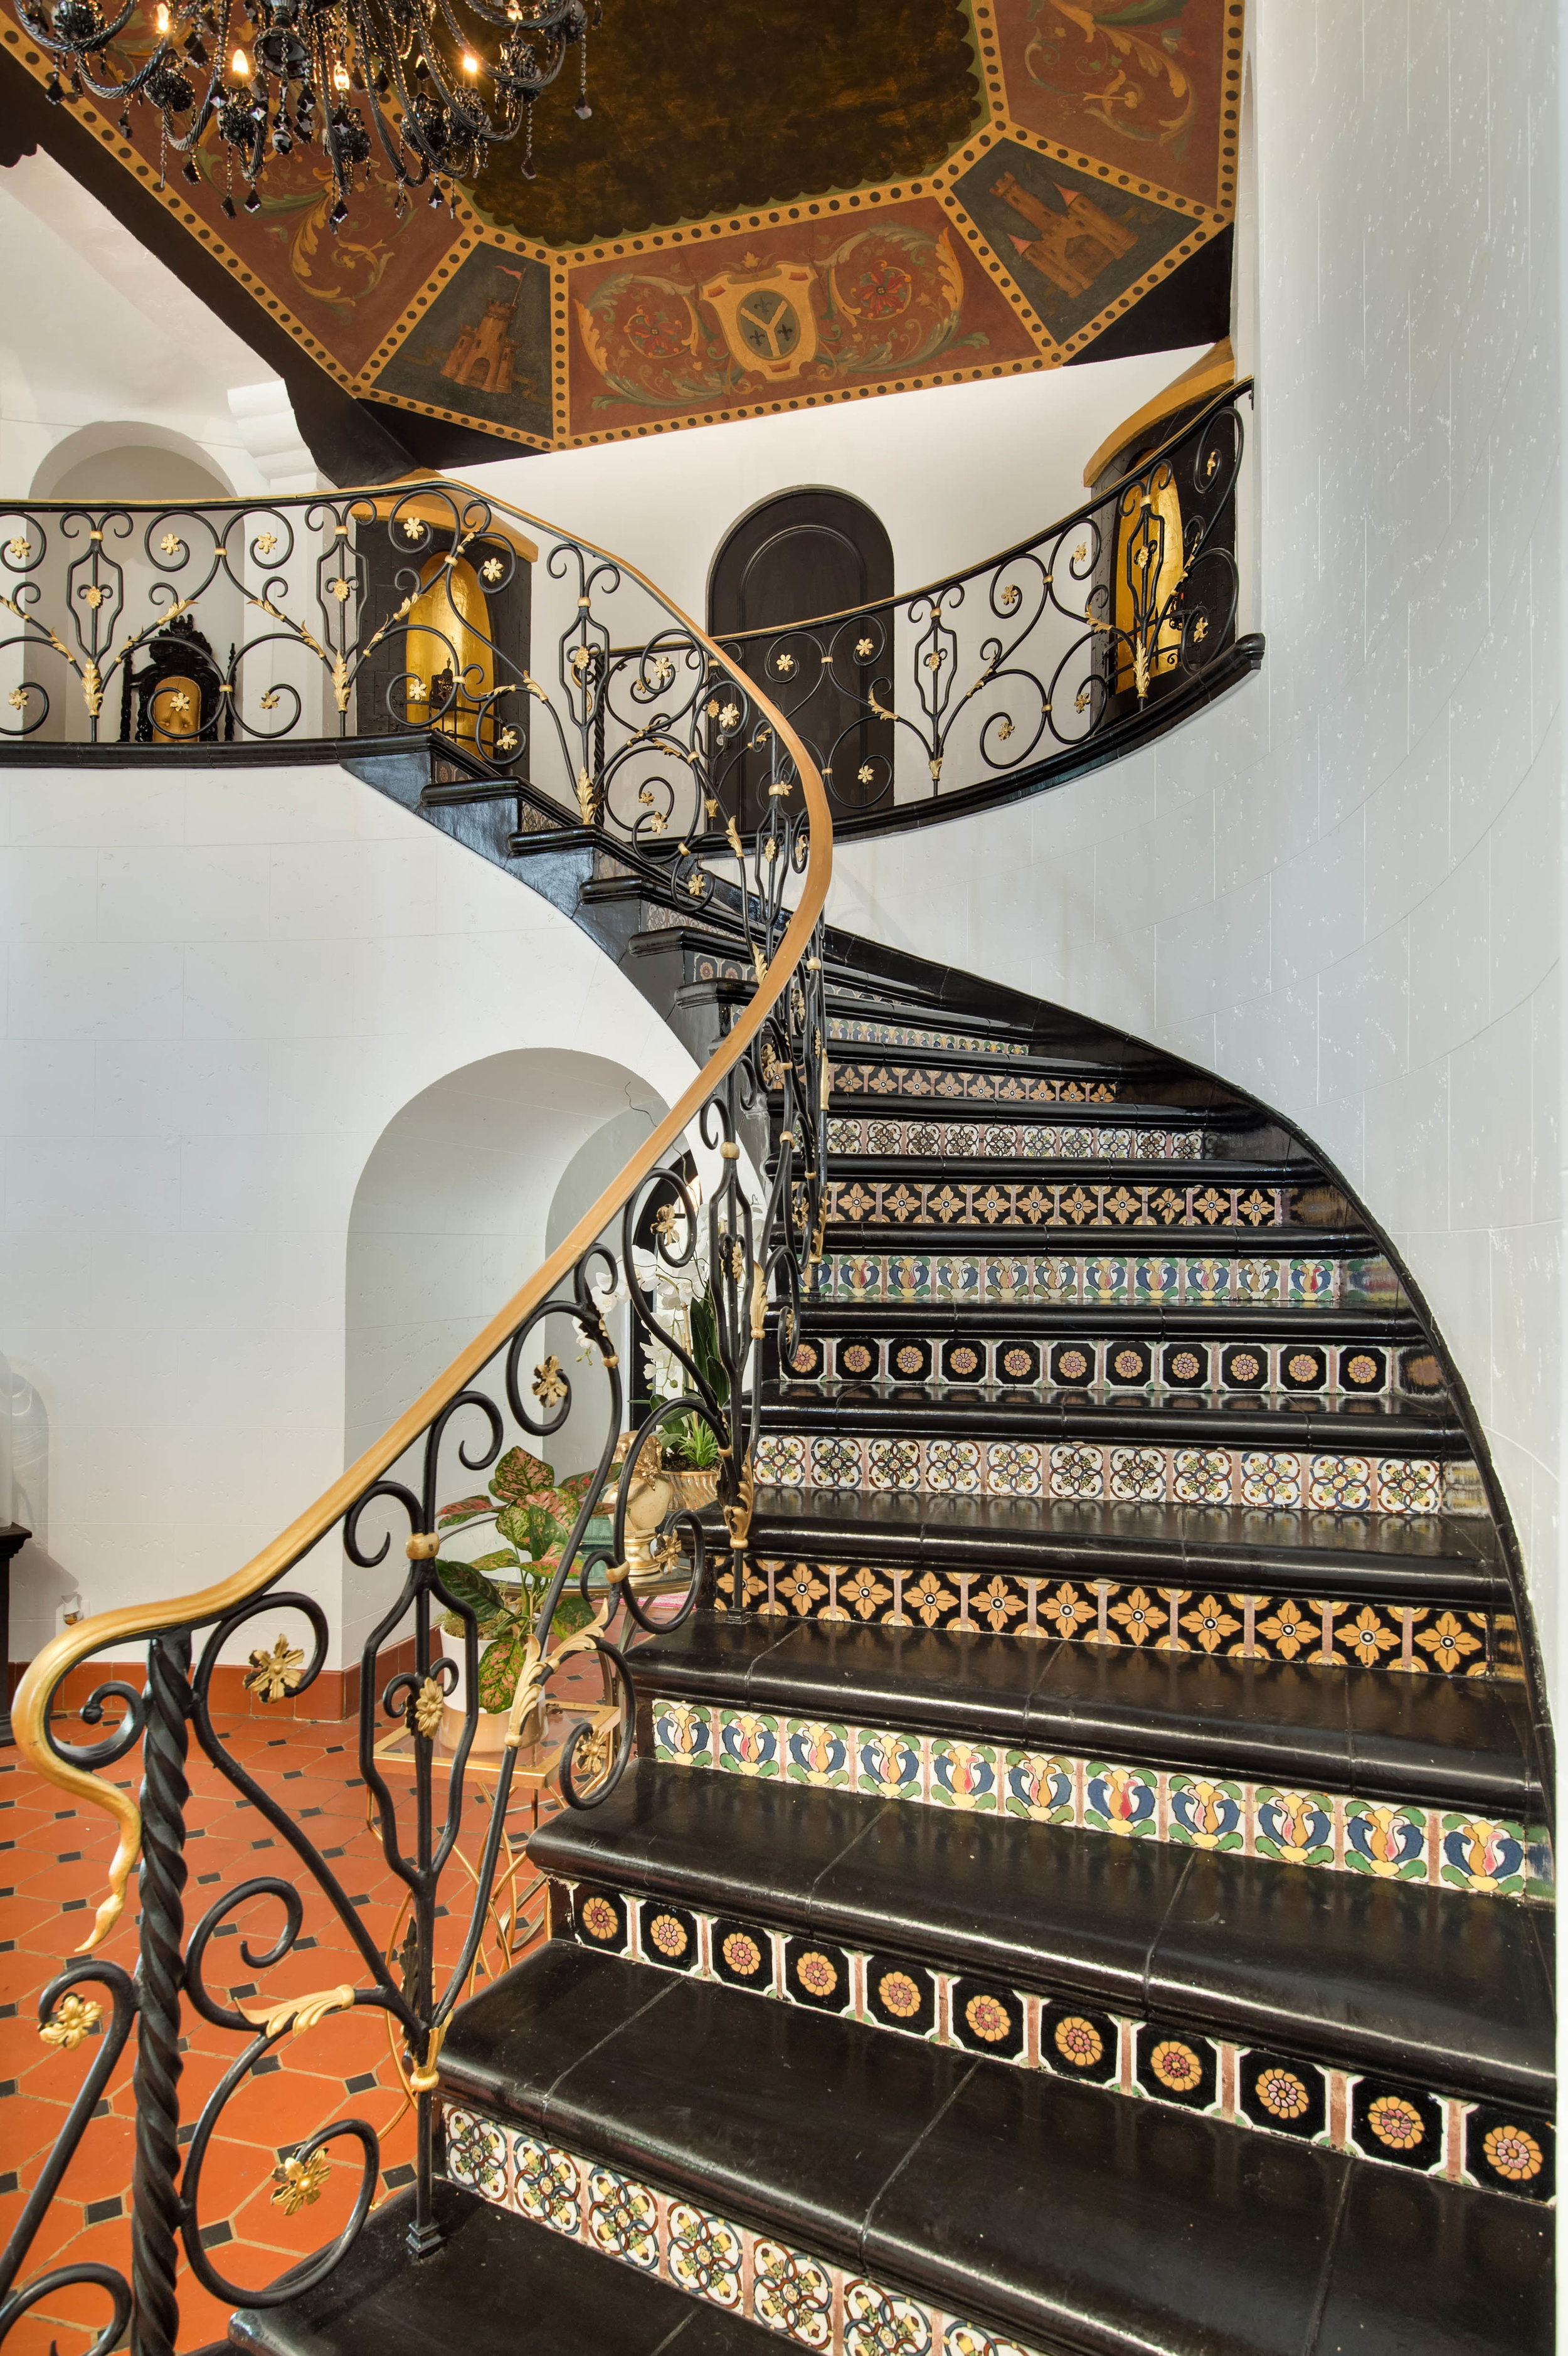 010 Stairs 006 Pool 4915 Los Feliz For Sale Los Angeles Lease The Malibu Life Team Luxury Real Estate.jpg